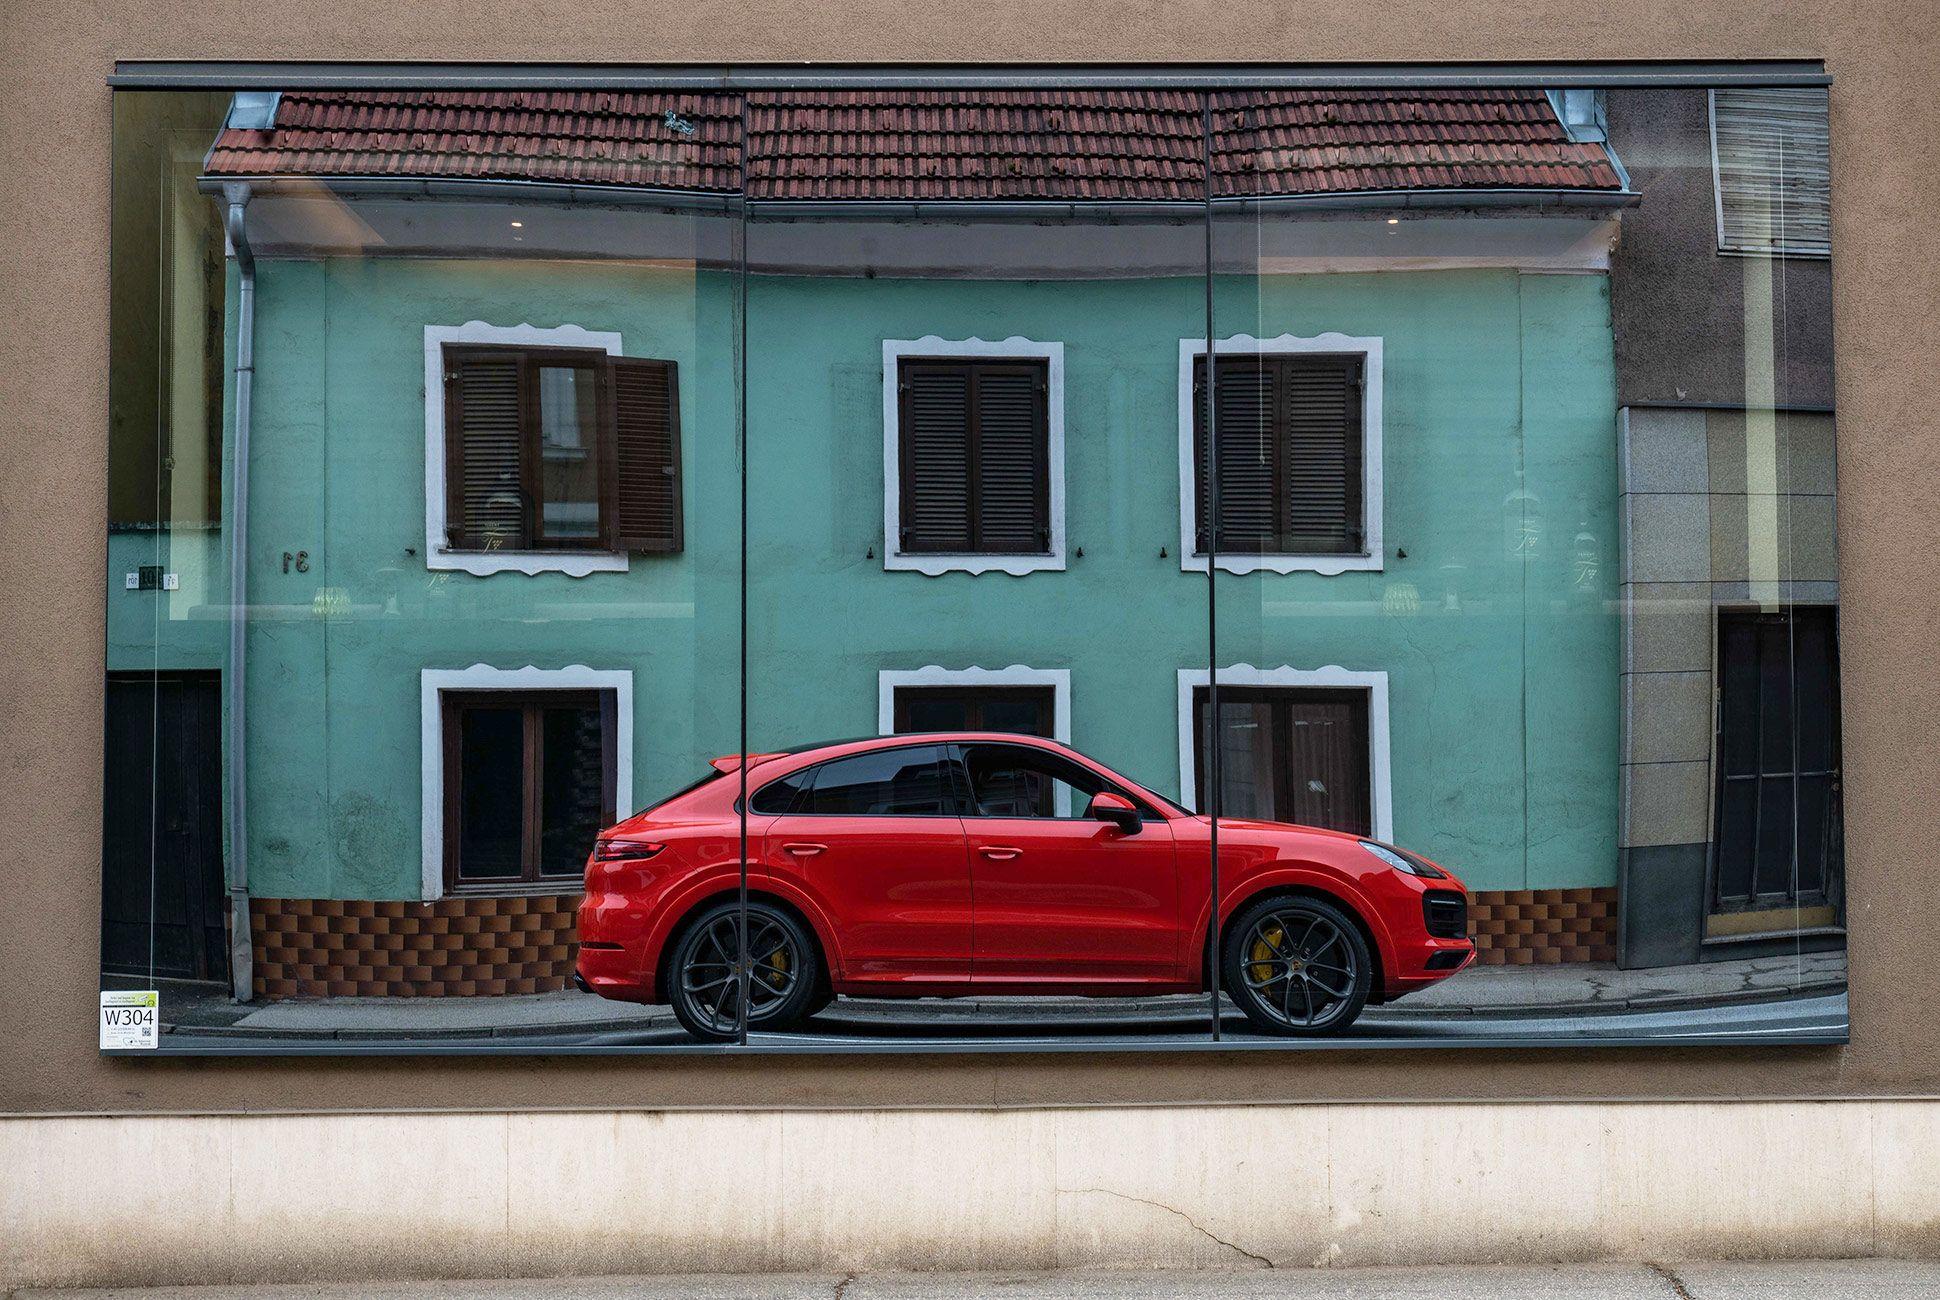 2020-Porsche-Cayenne-Coupe-Review-gear-patrol-slide-4